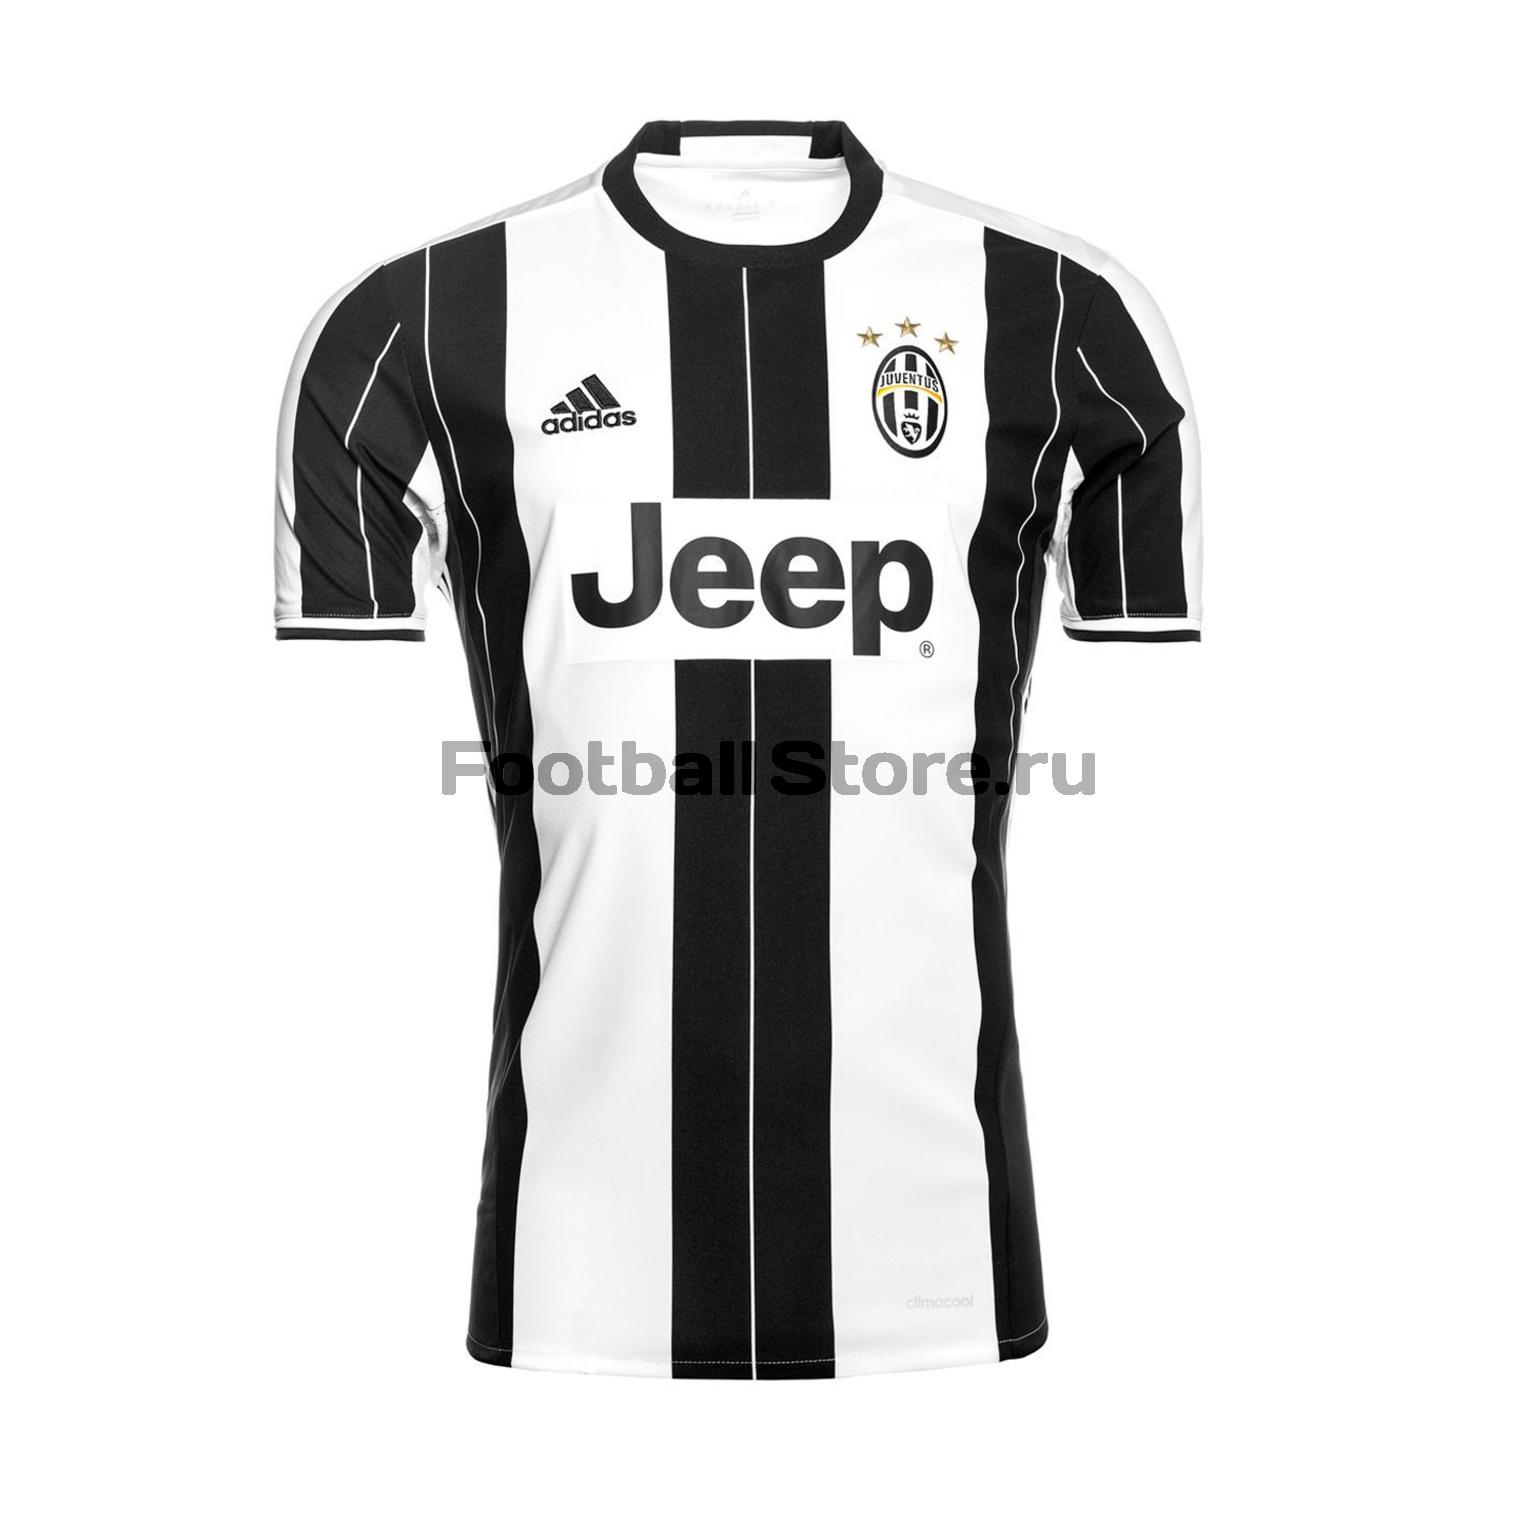 Adidas Футболка подростковая Adidas Juventus Home AI6244